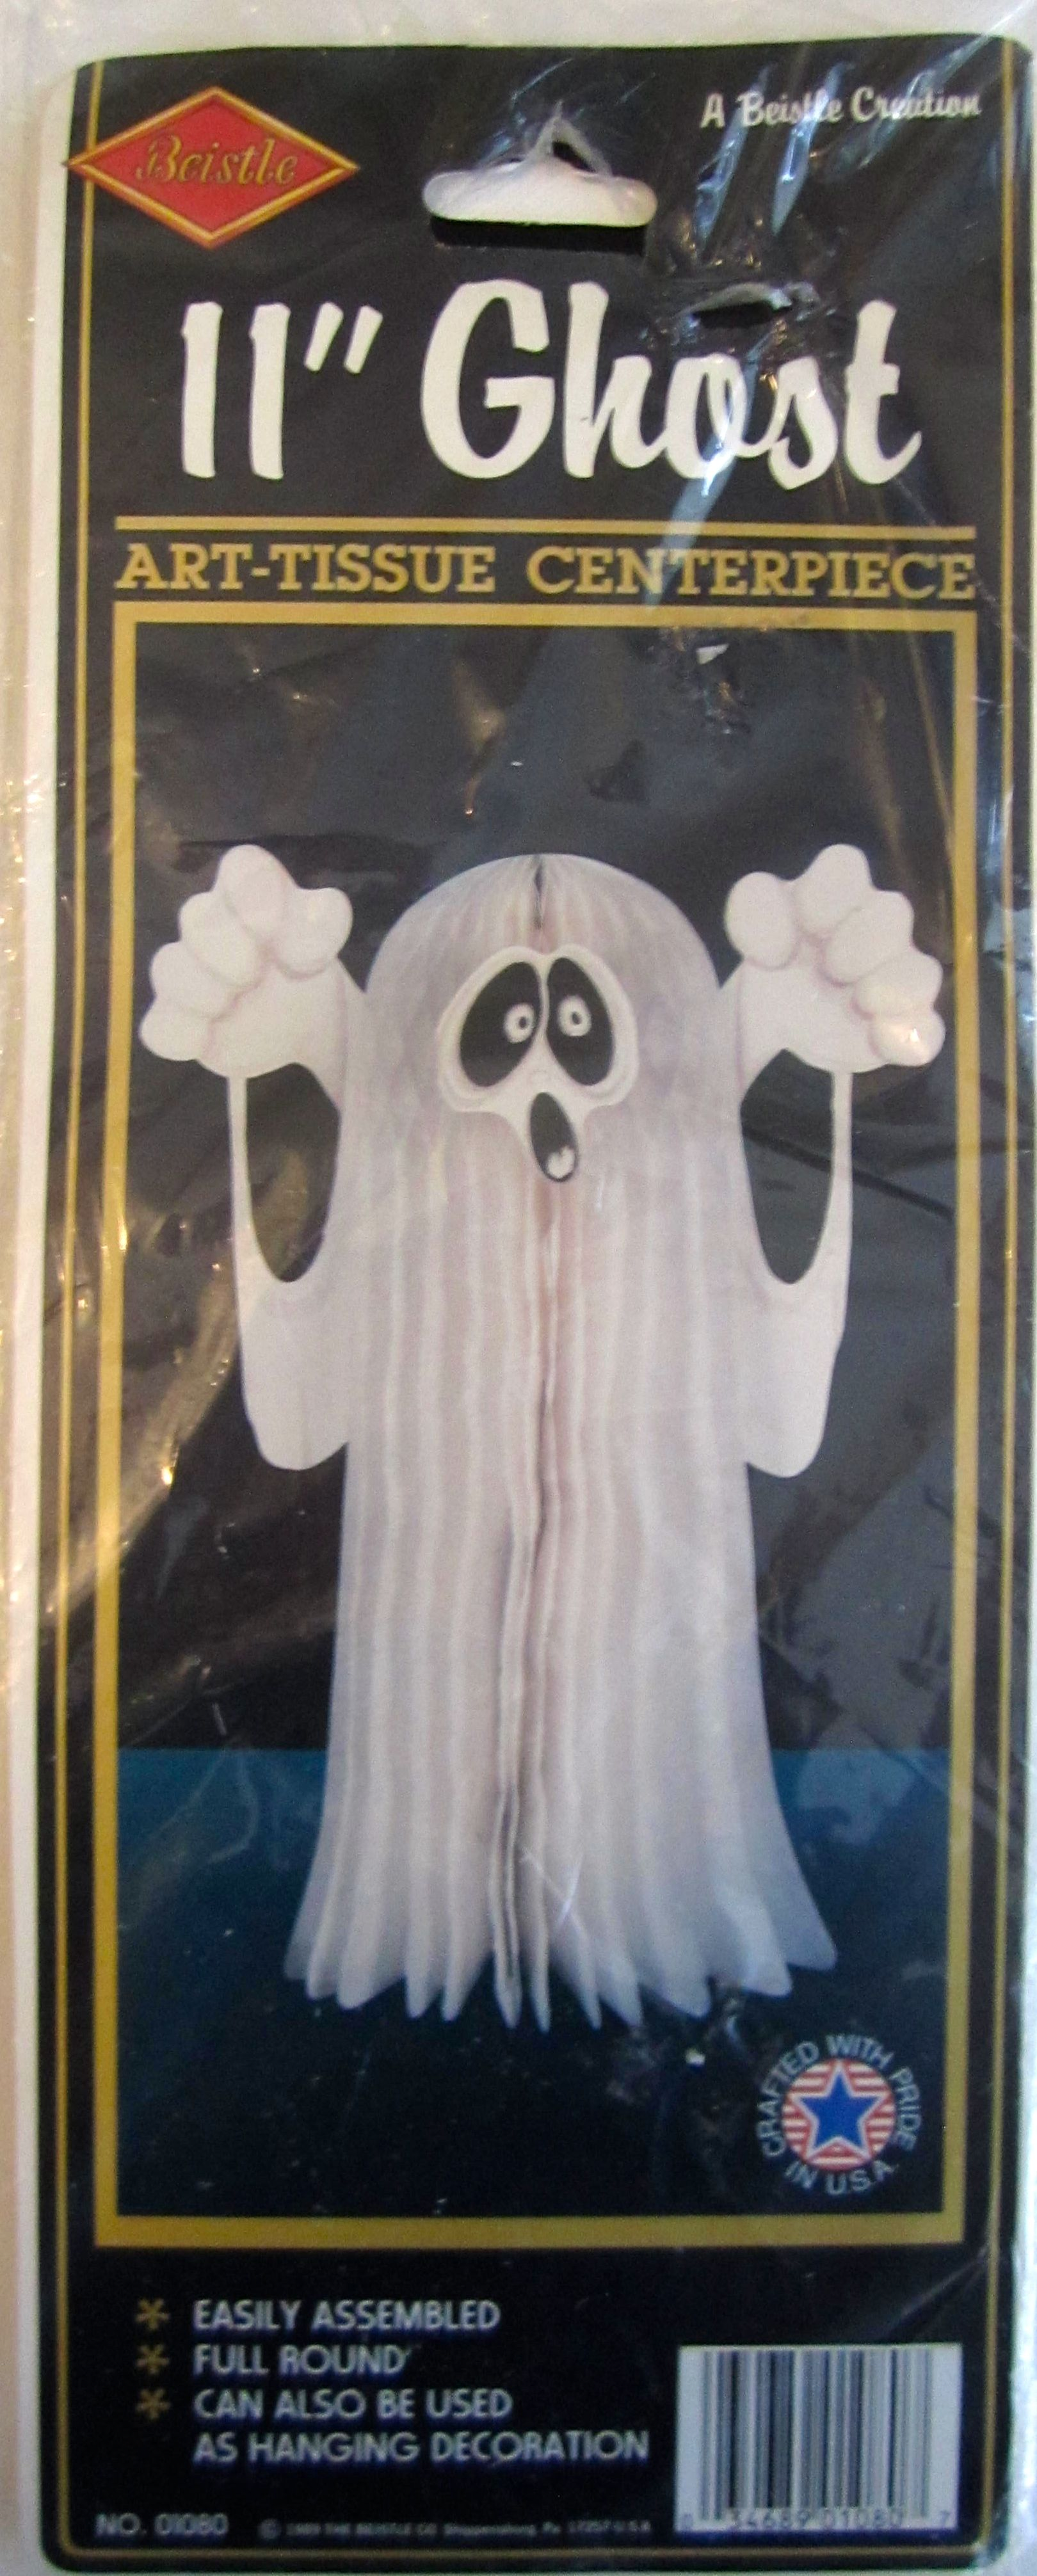 Vintage Beistle Ghost Art Tissue Centerpiece Halloween Decoration From The